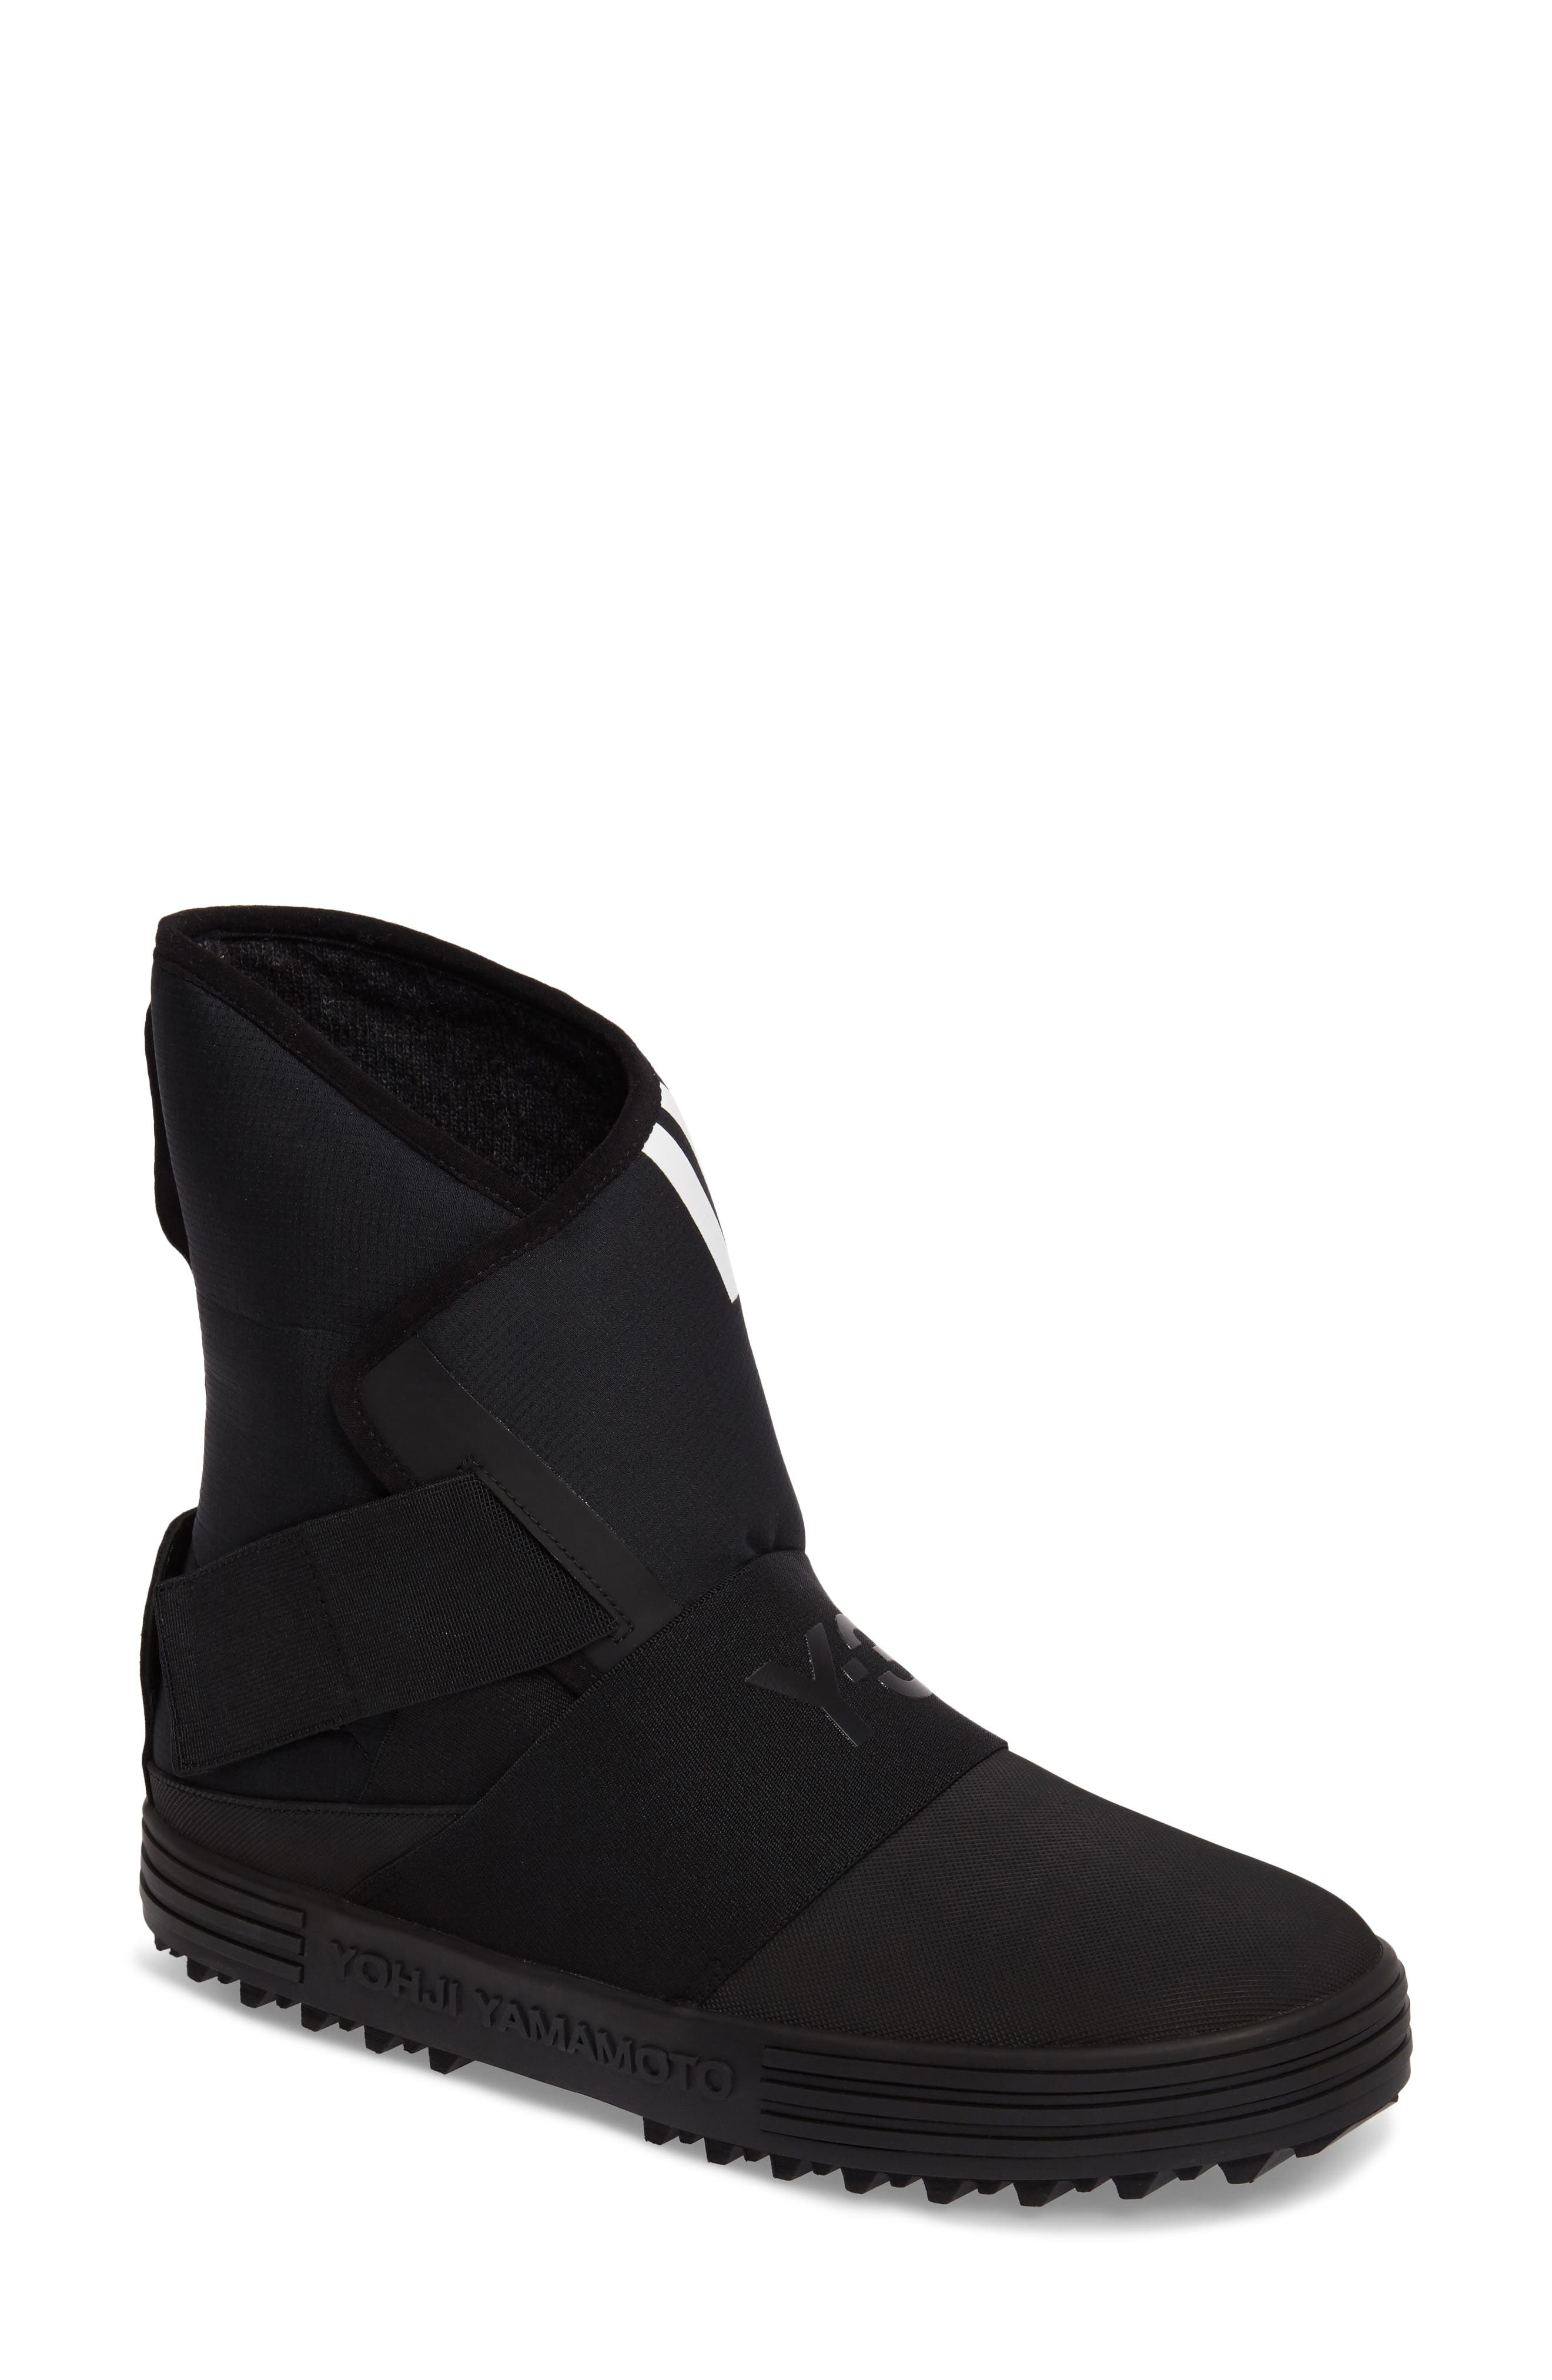 Sno Foxing High Top Sneaker,                         Main,                         color, Core Black / White